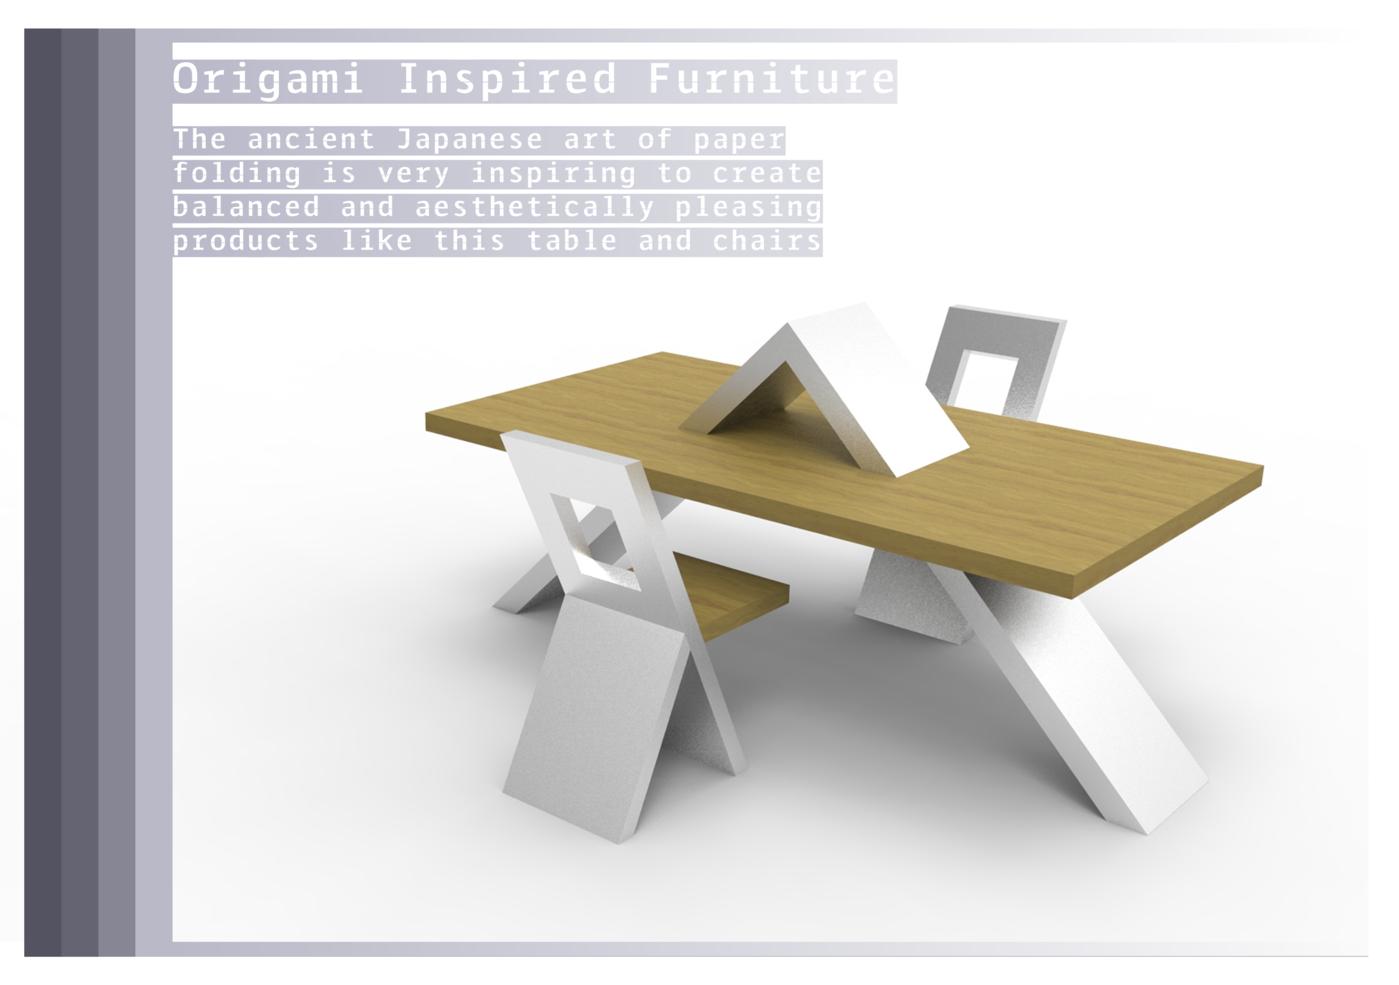 50 Abstract Geometric Furniture Designs | Geometric furniture ... | 985x1399